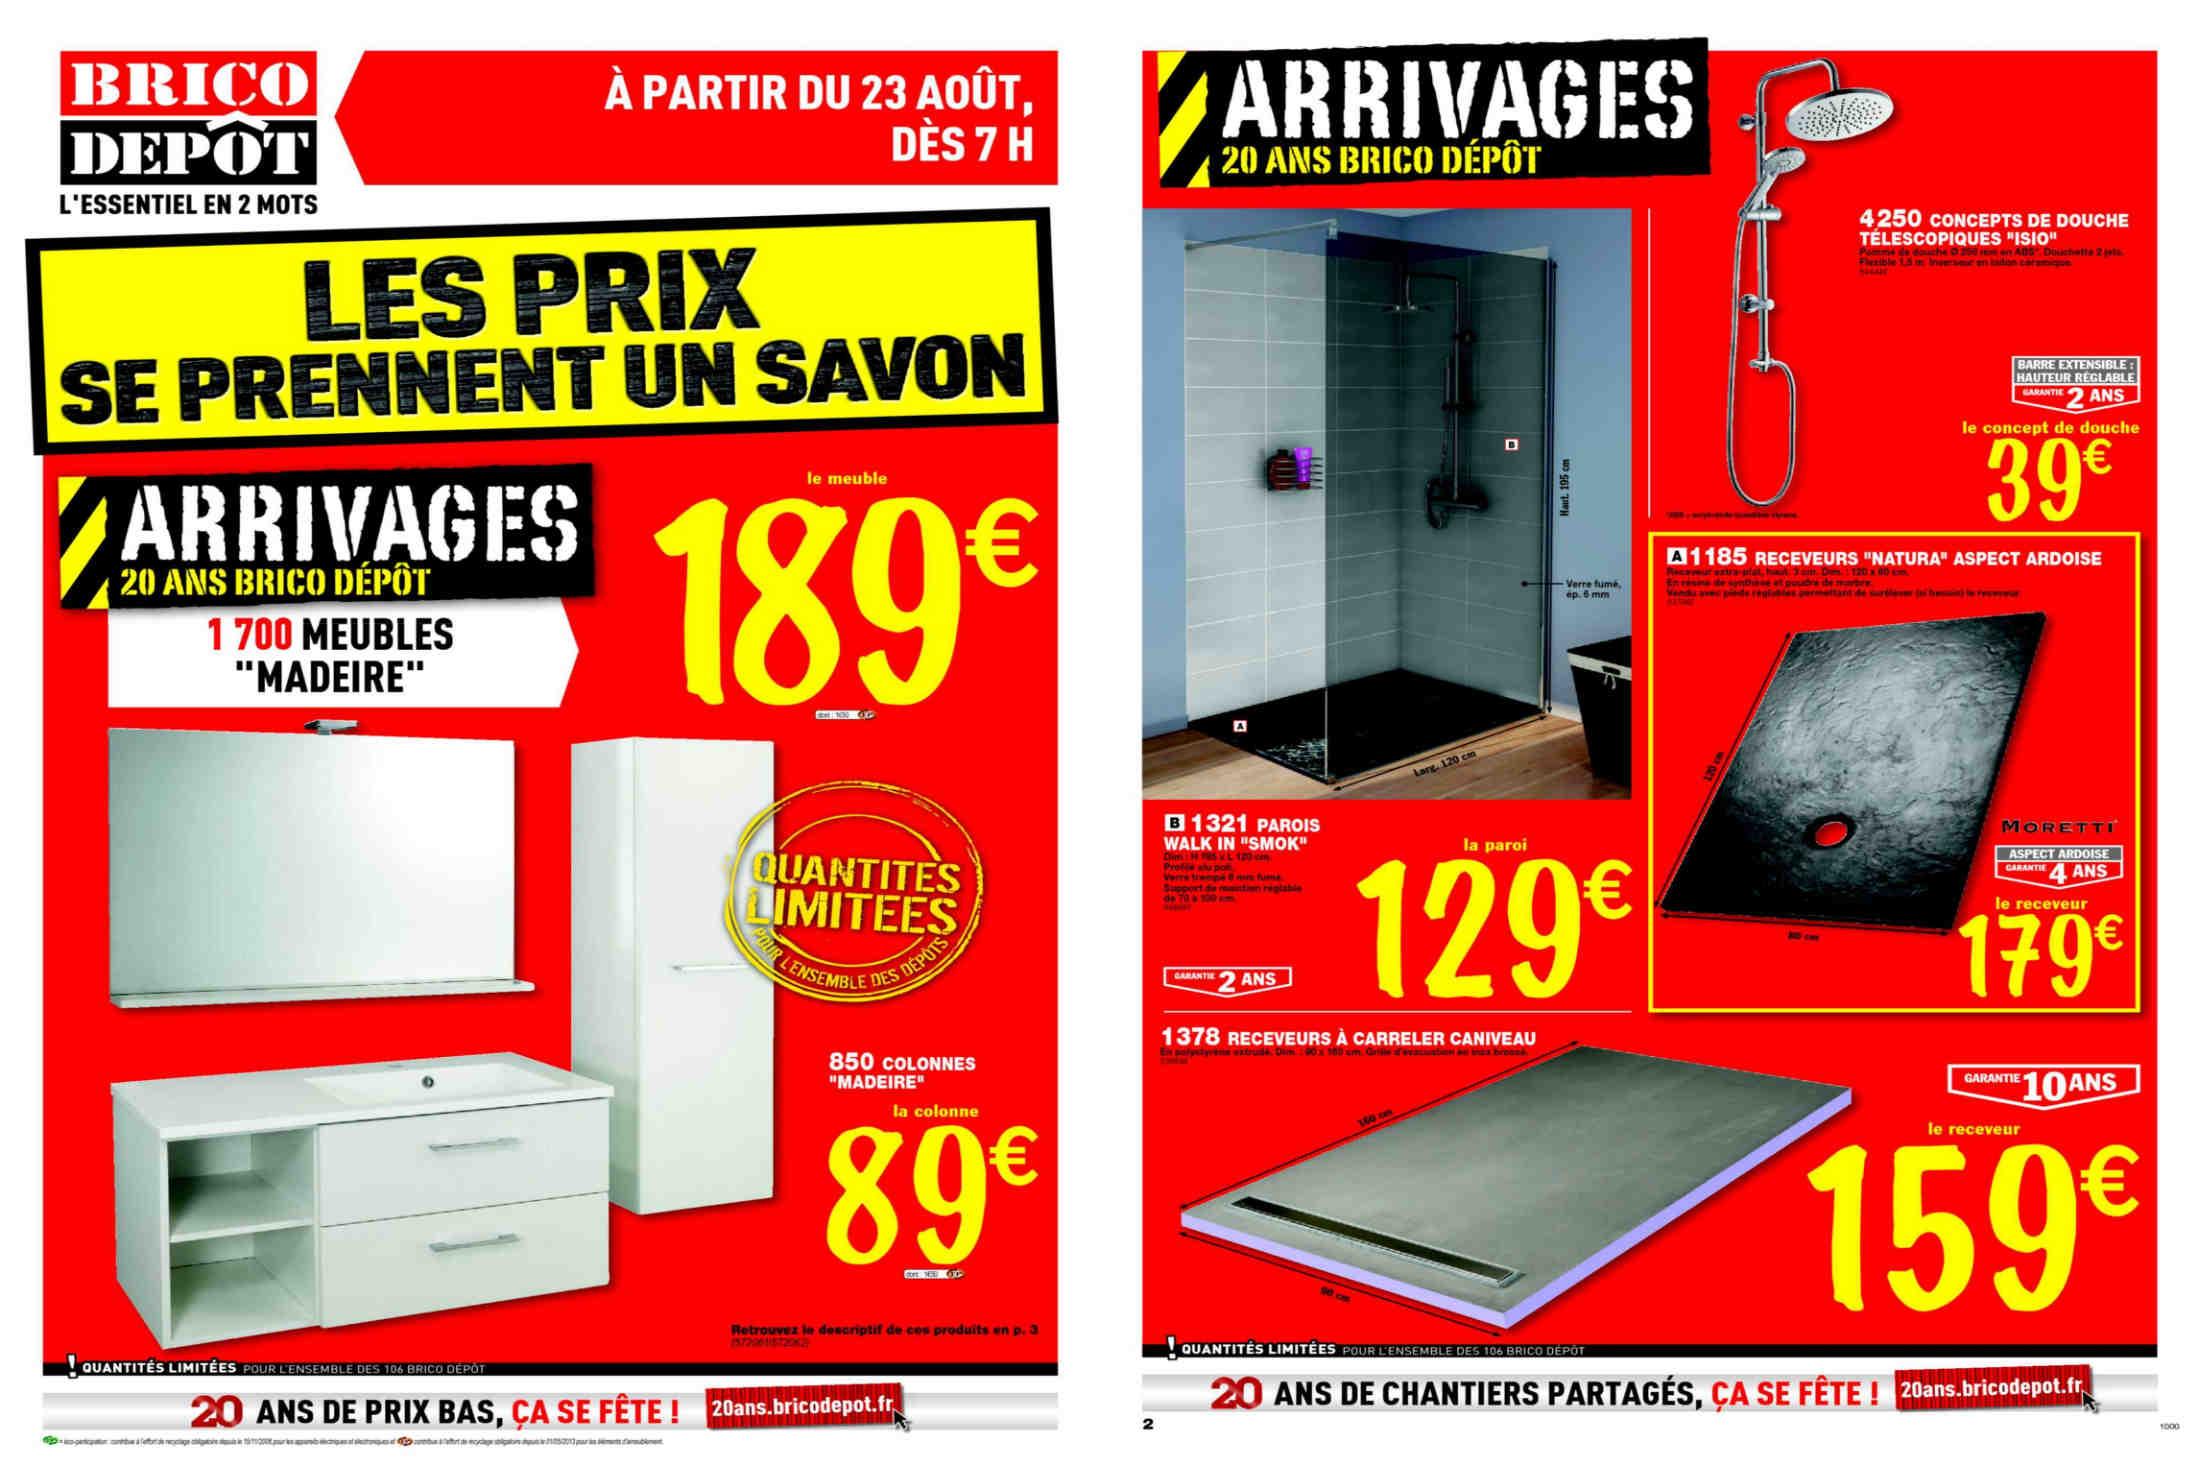 lino salle de bain brico depot economiser la maison. Black Bedroom Furniture Sets. Home Design Ideas